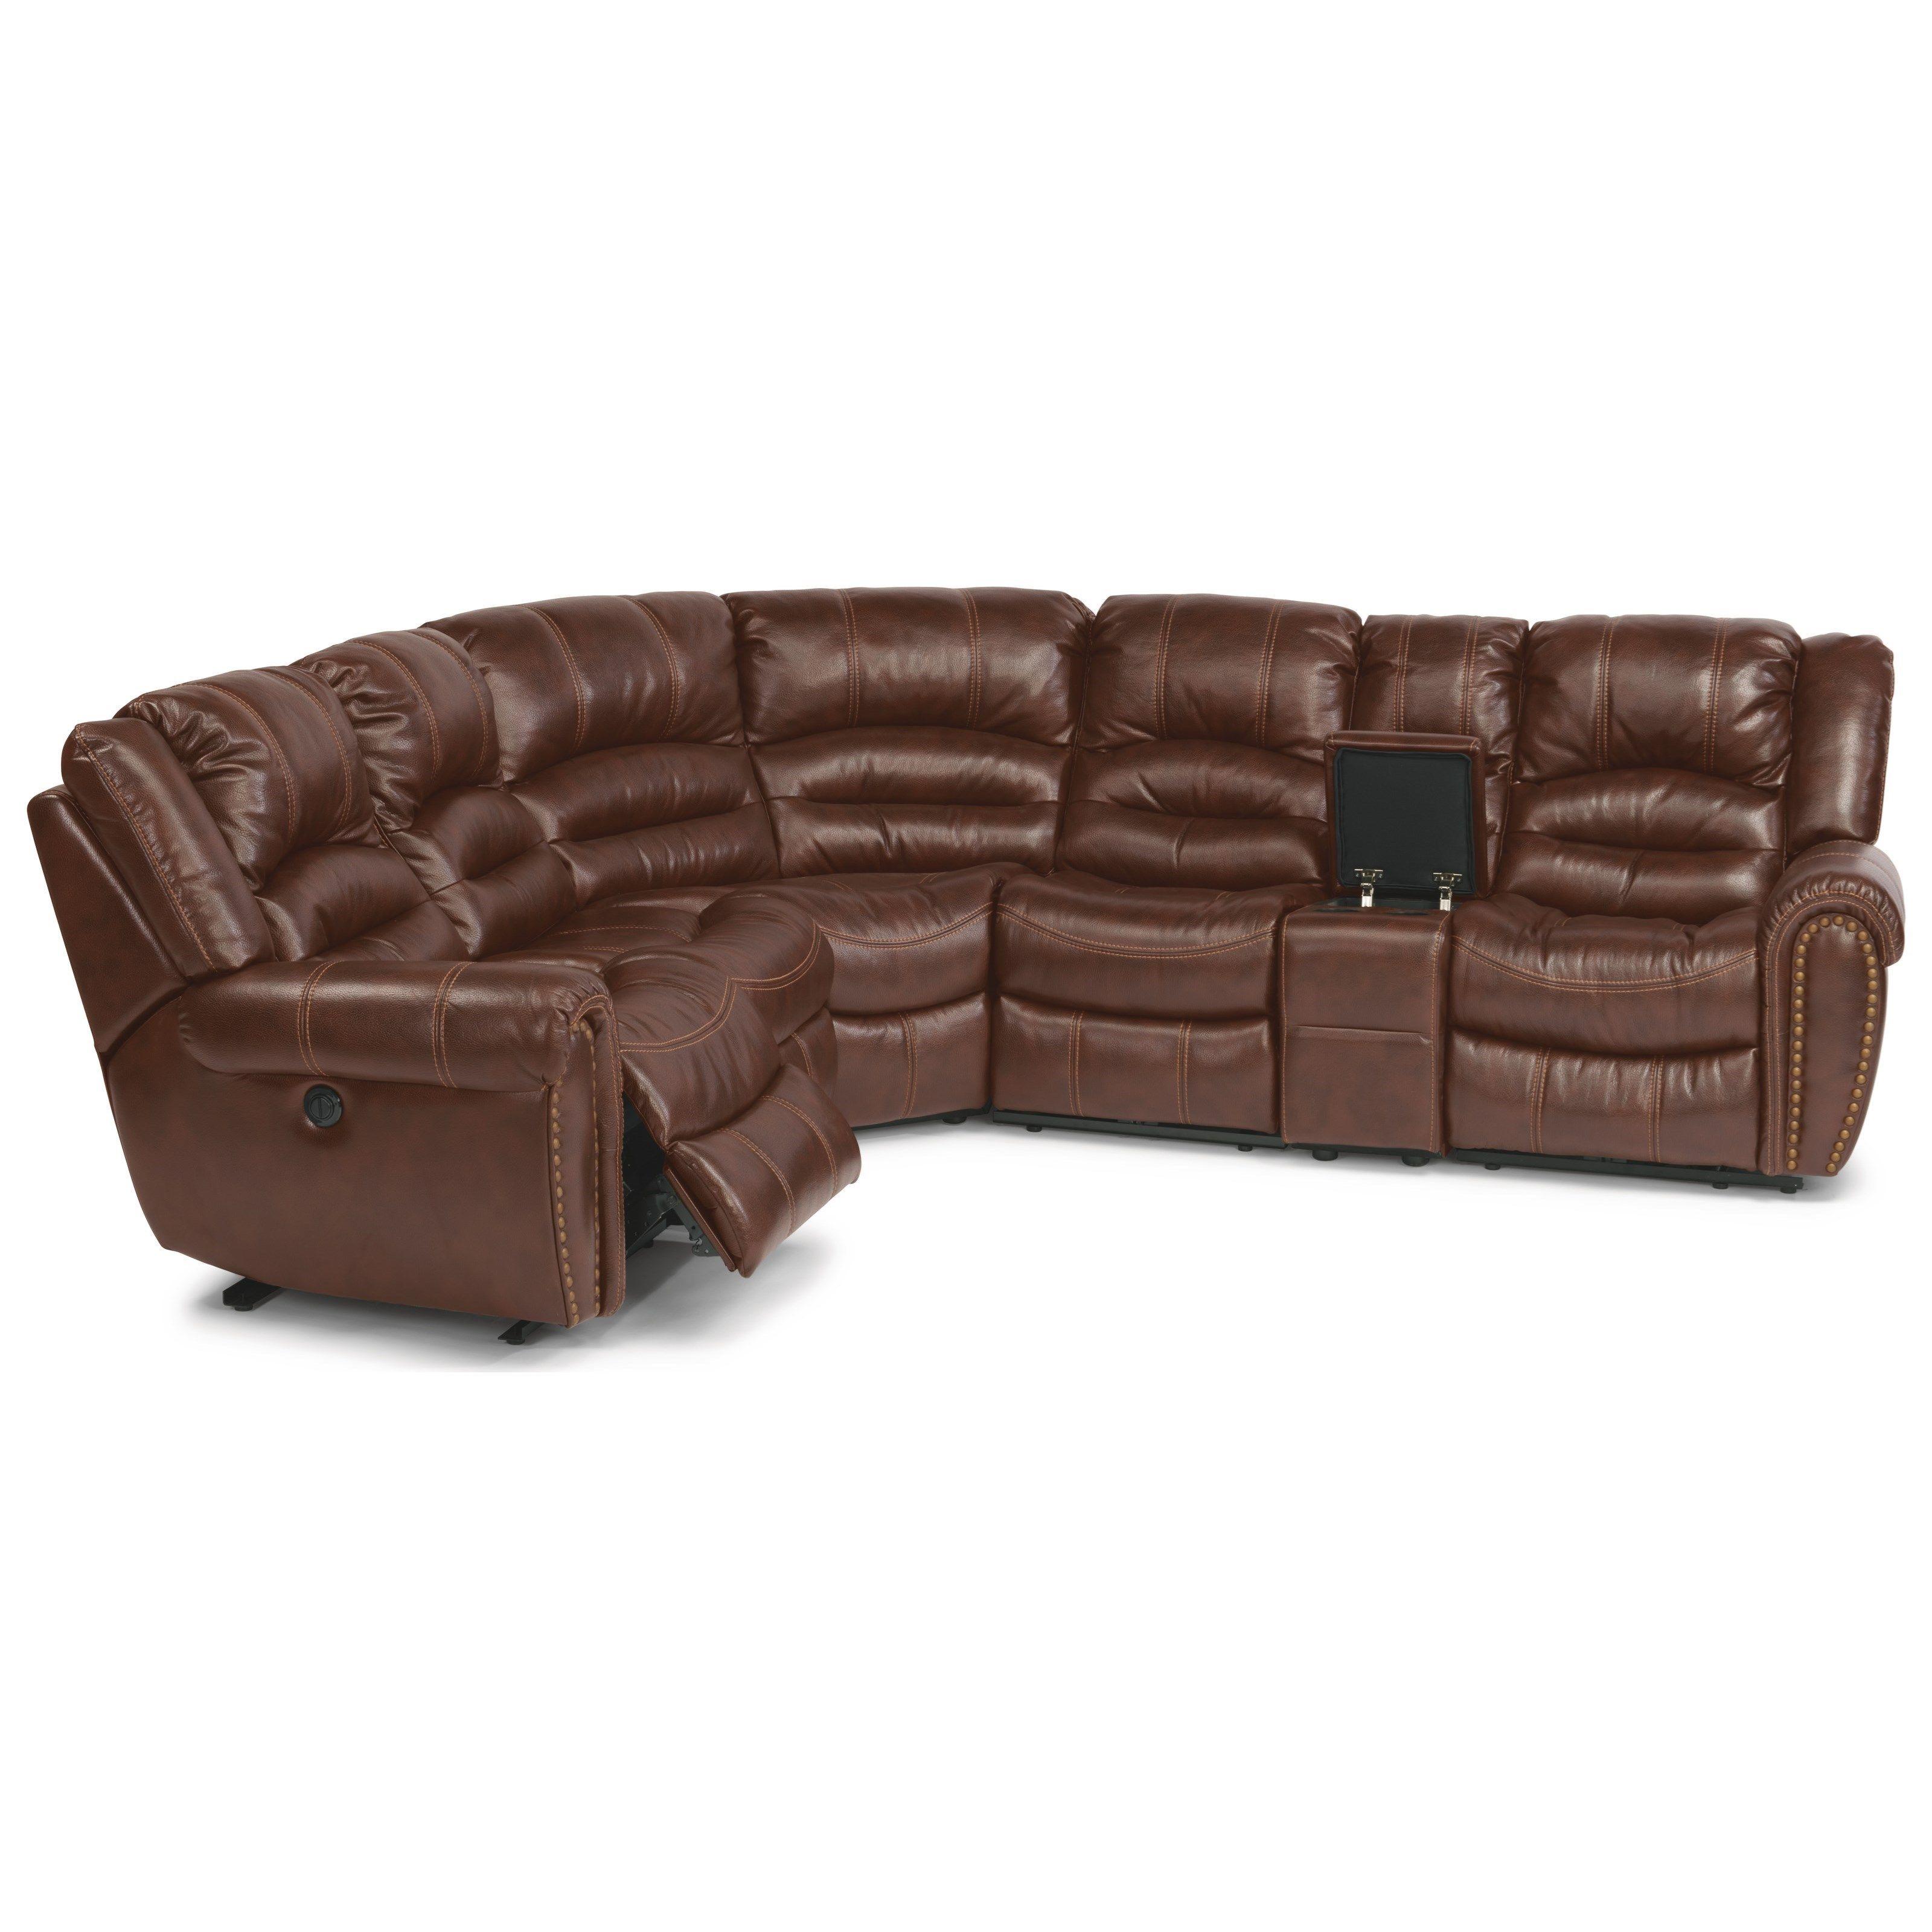 crosstown 6 pc power reclining sectional sofa by flexsteel